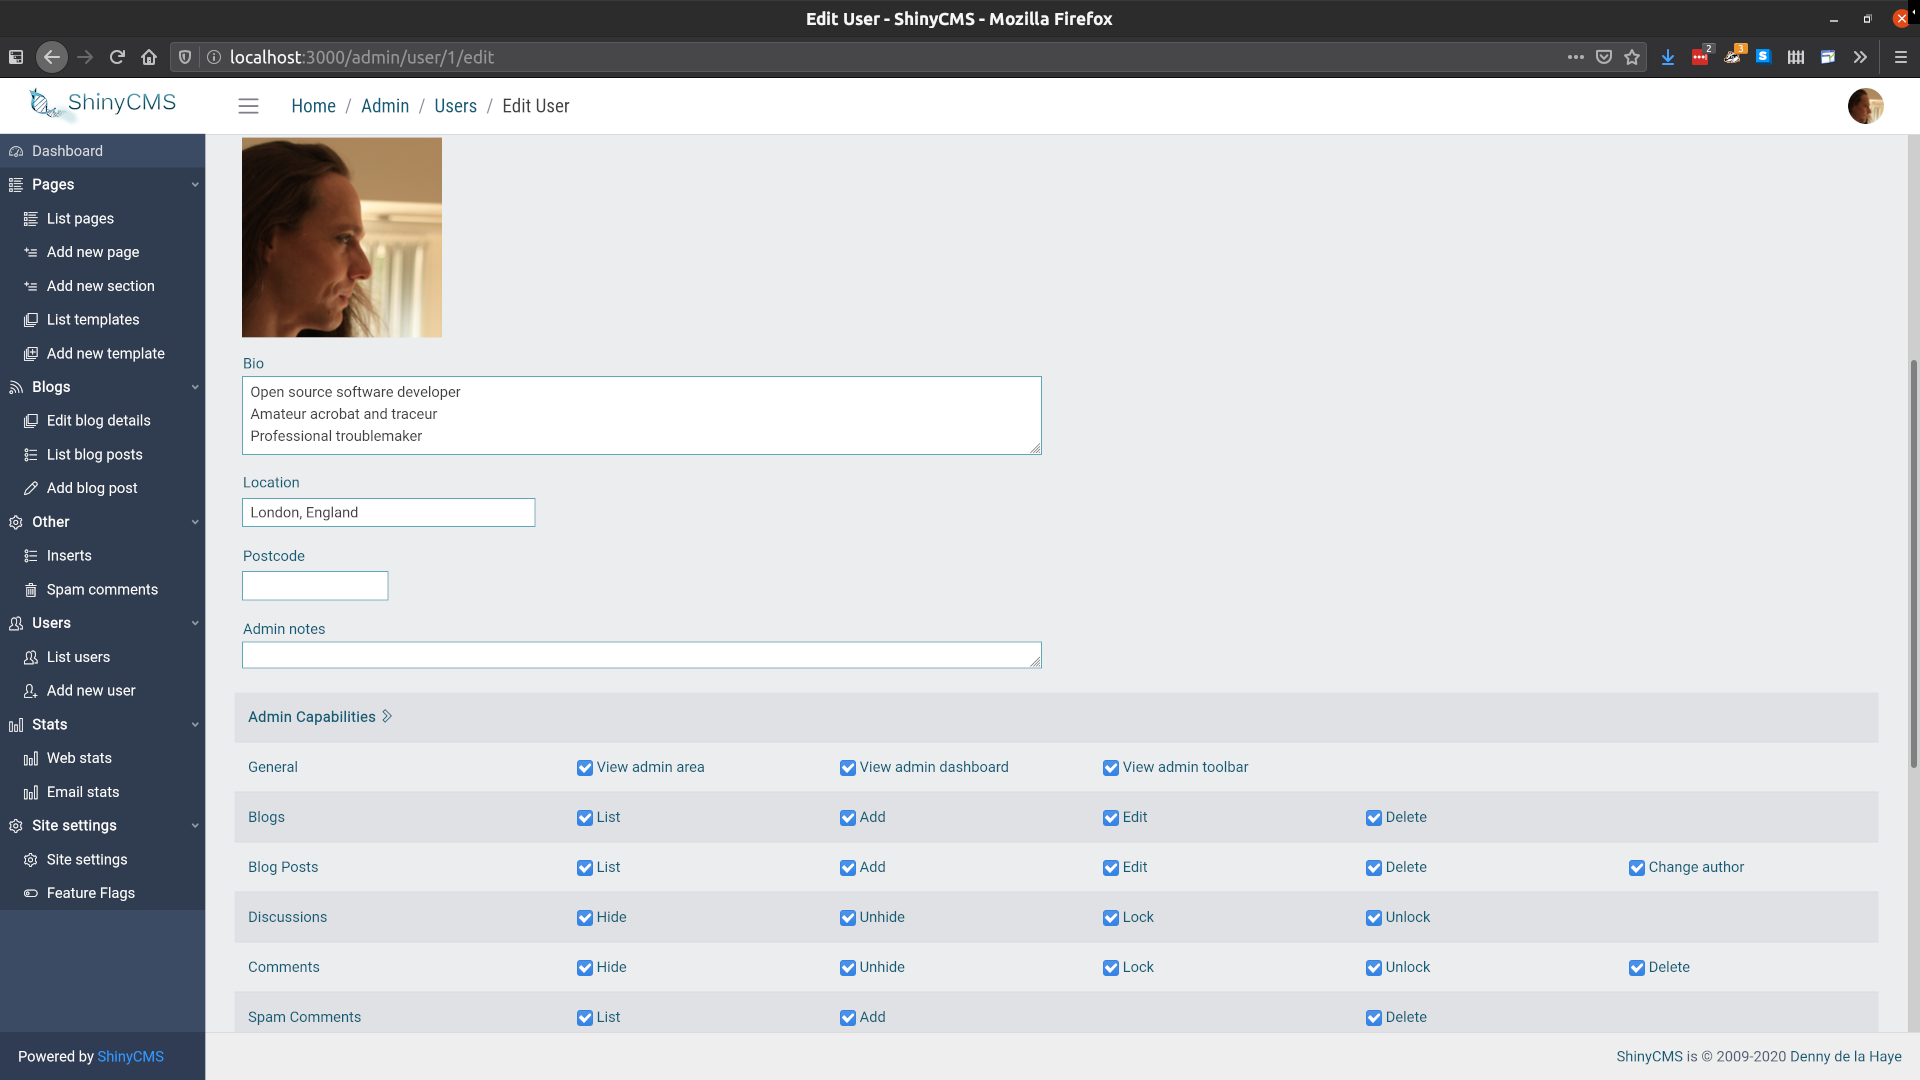 Screenshot of ShinyCMS admin area